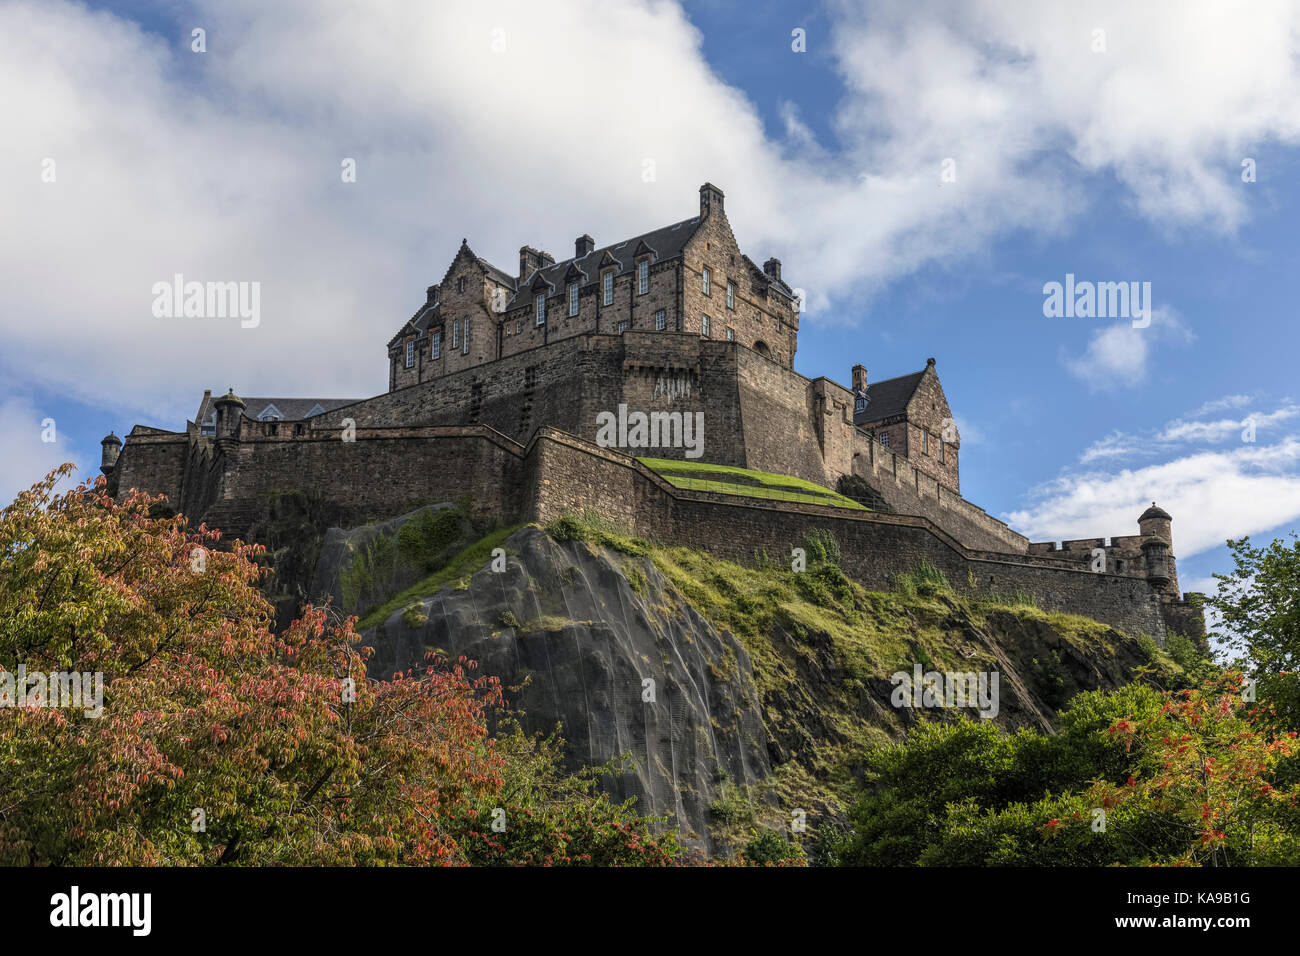 Edinburgh Firth Of Forth Stock Photos & Edinburgh Firth Of ...